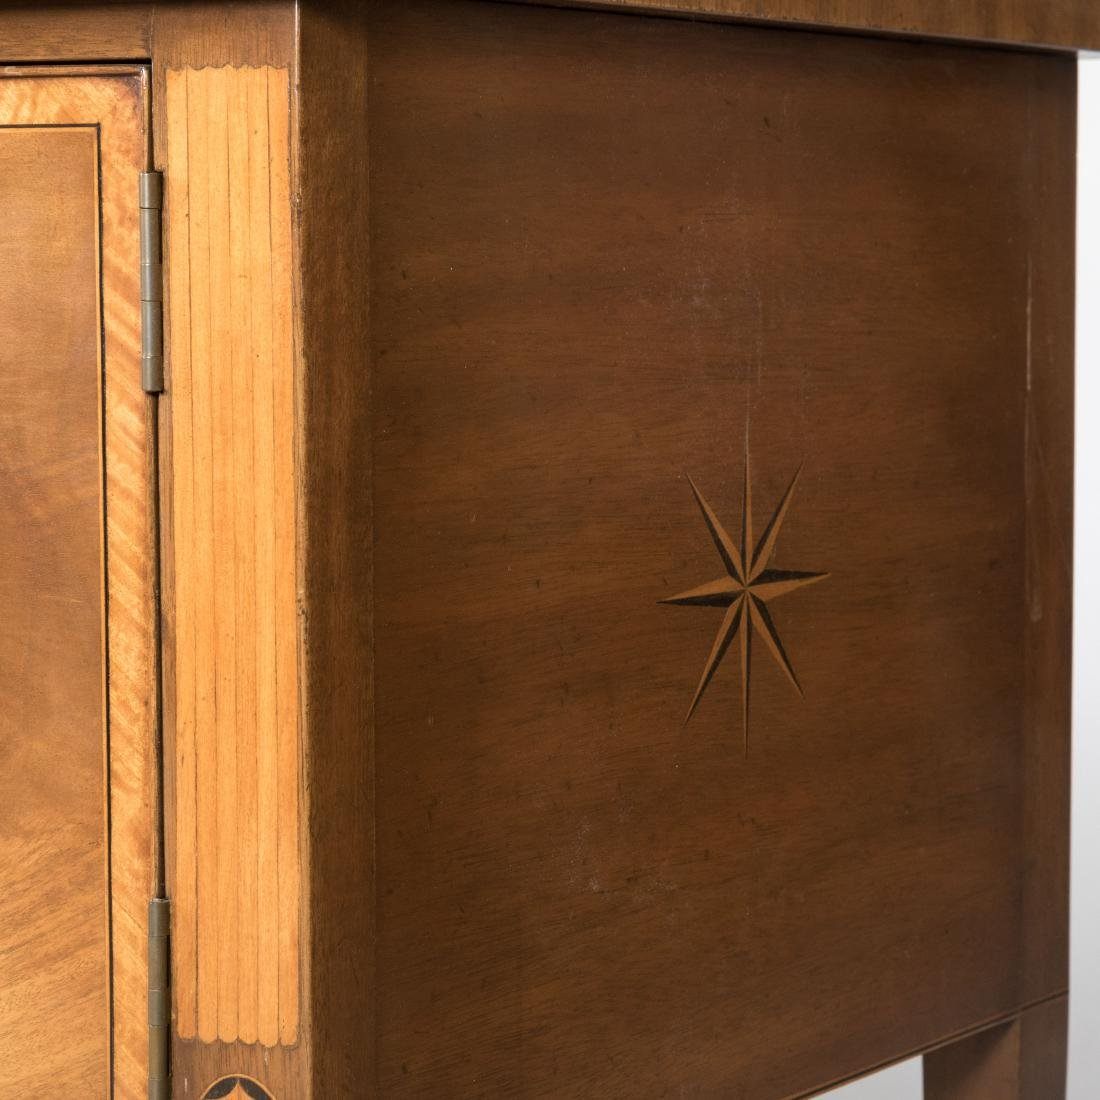 Inlaid Mahogany Colonial Williamsburg Sideboard - 6